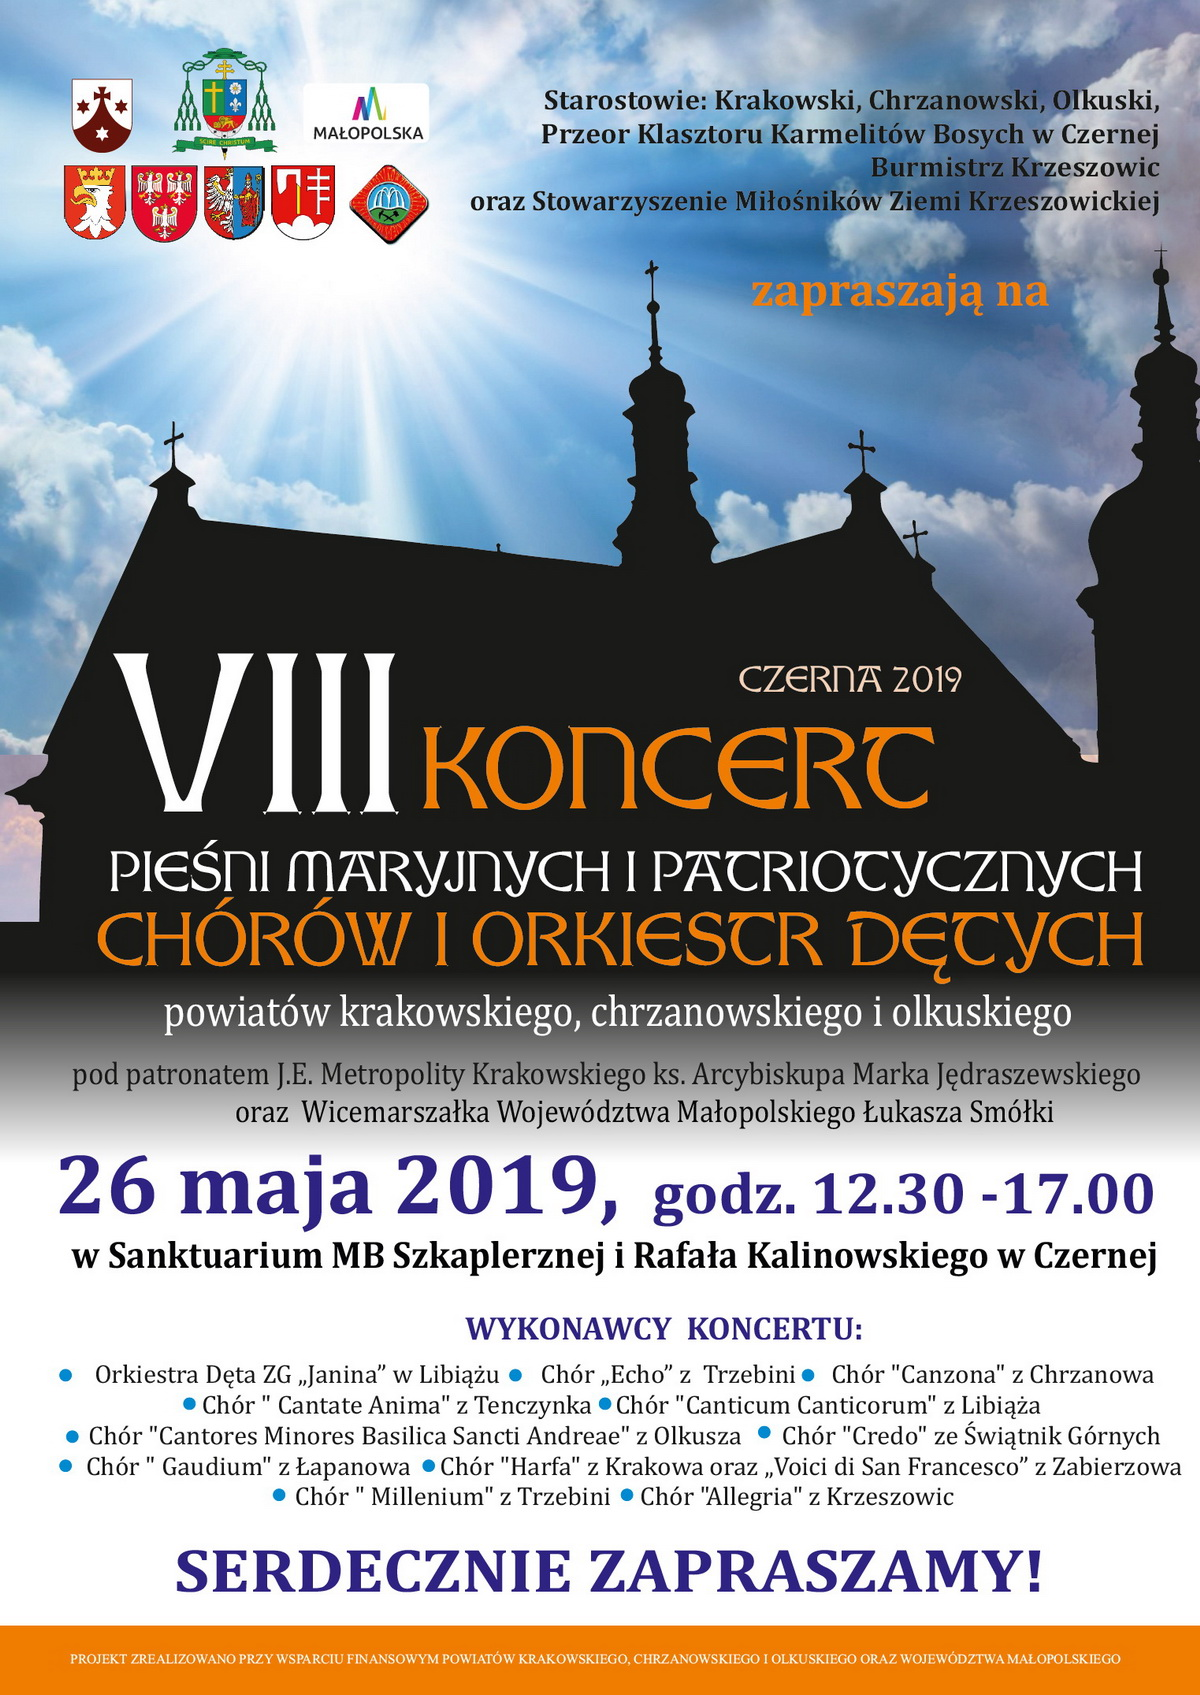 Plakat chóry Czerna